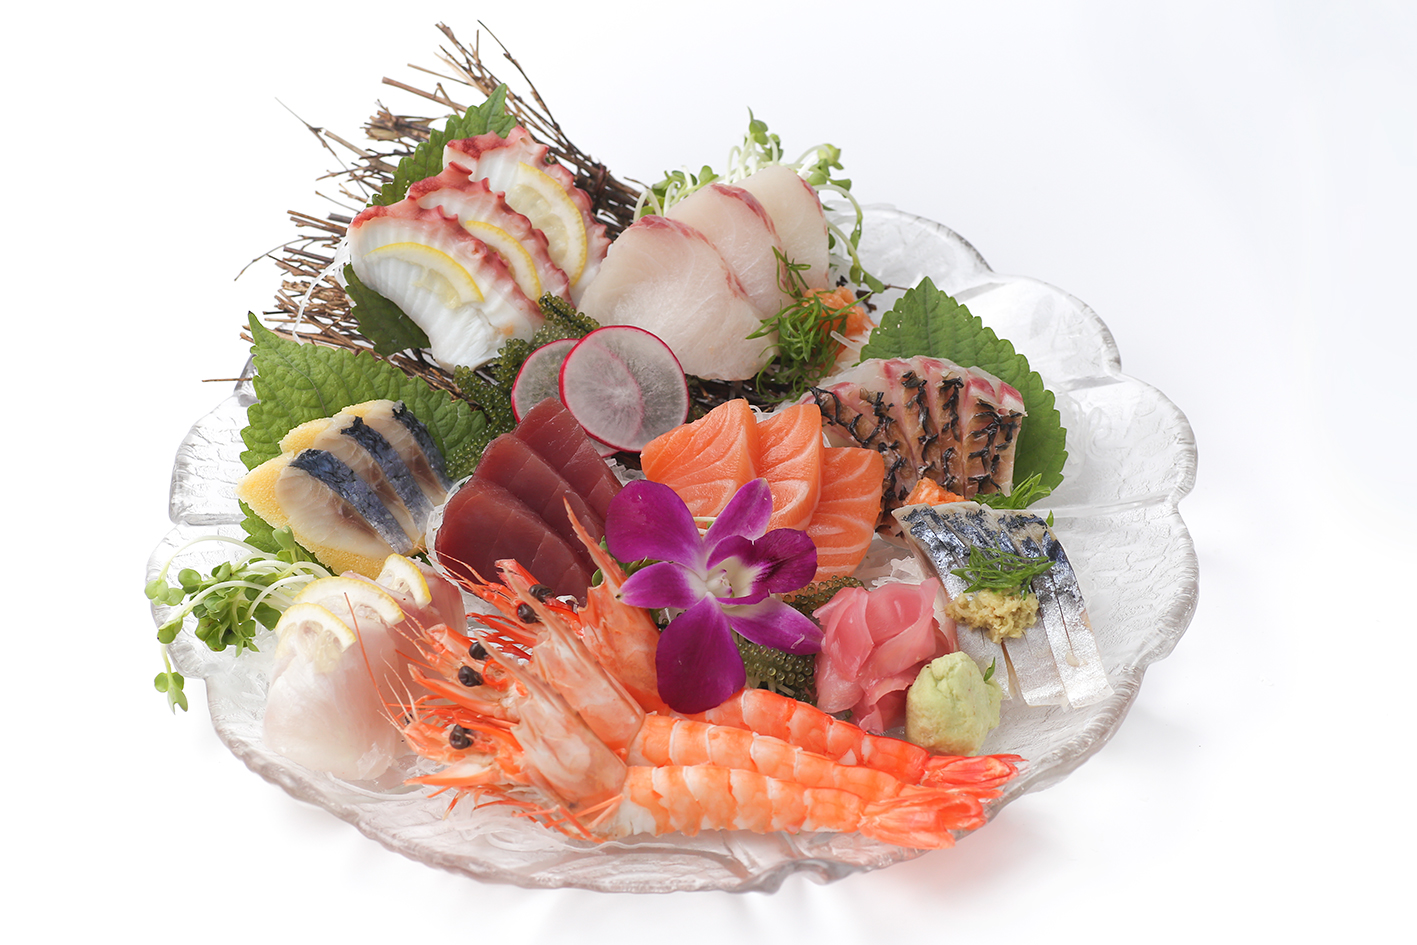 Sashimi Tổng Hợp (9 loại)